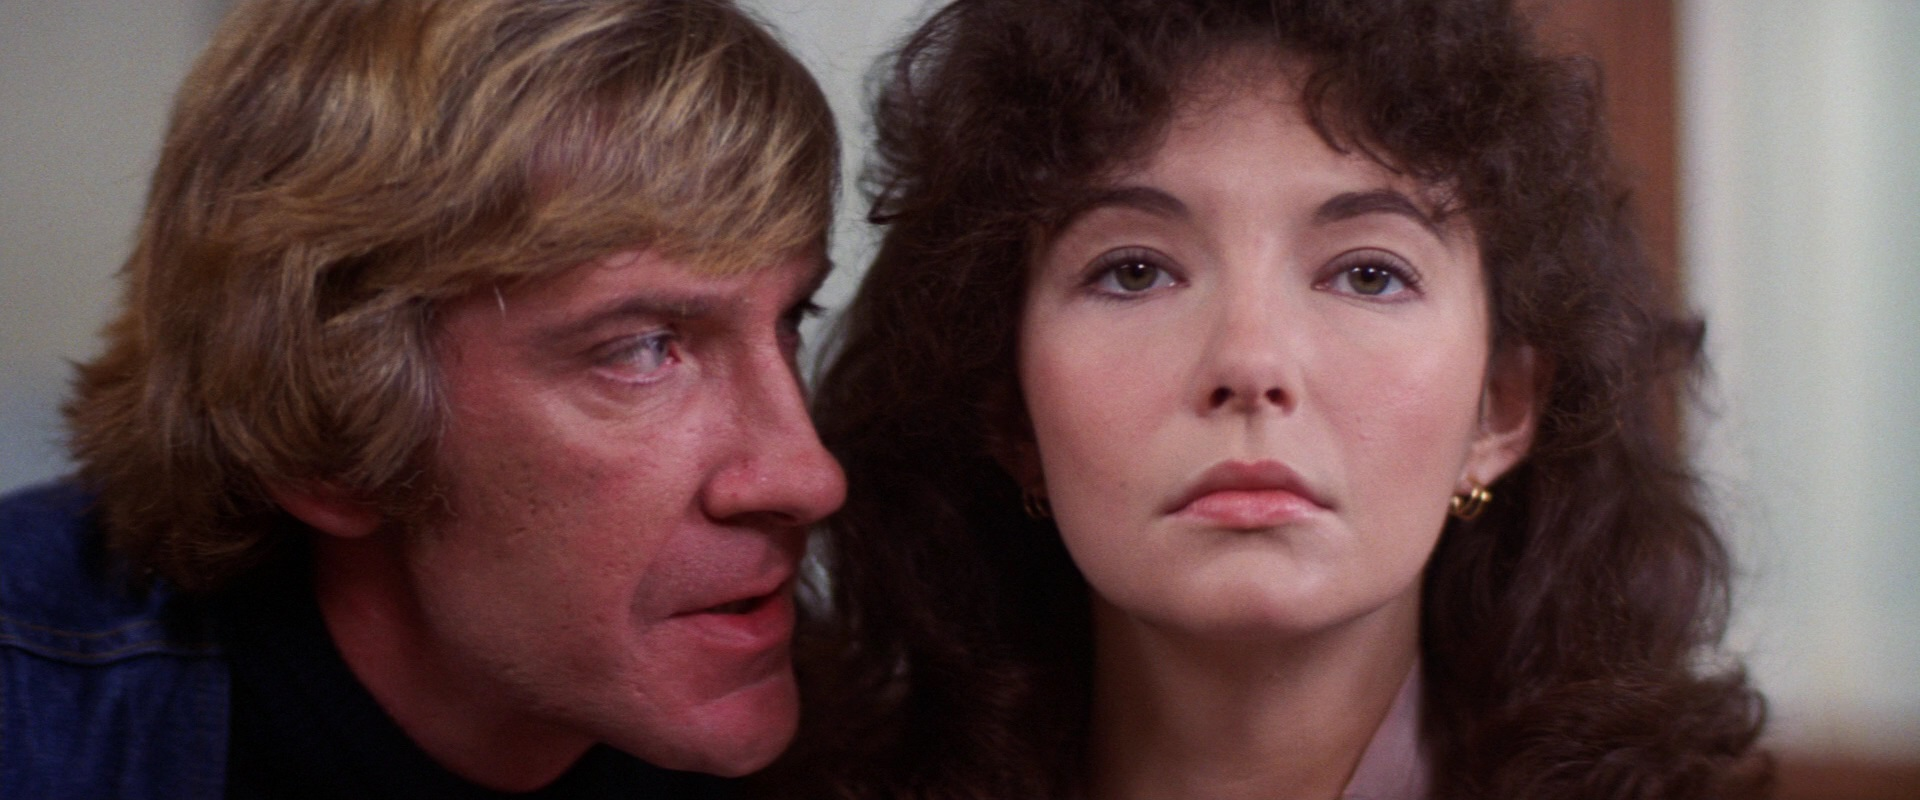 Dr Leslie John Stephenson aka Jack the Ripper (David Warner) menaces Amy Robbins (Mary Steenburgen) in Time After Time (1979)